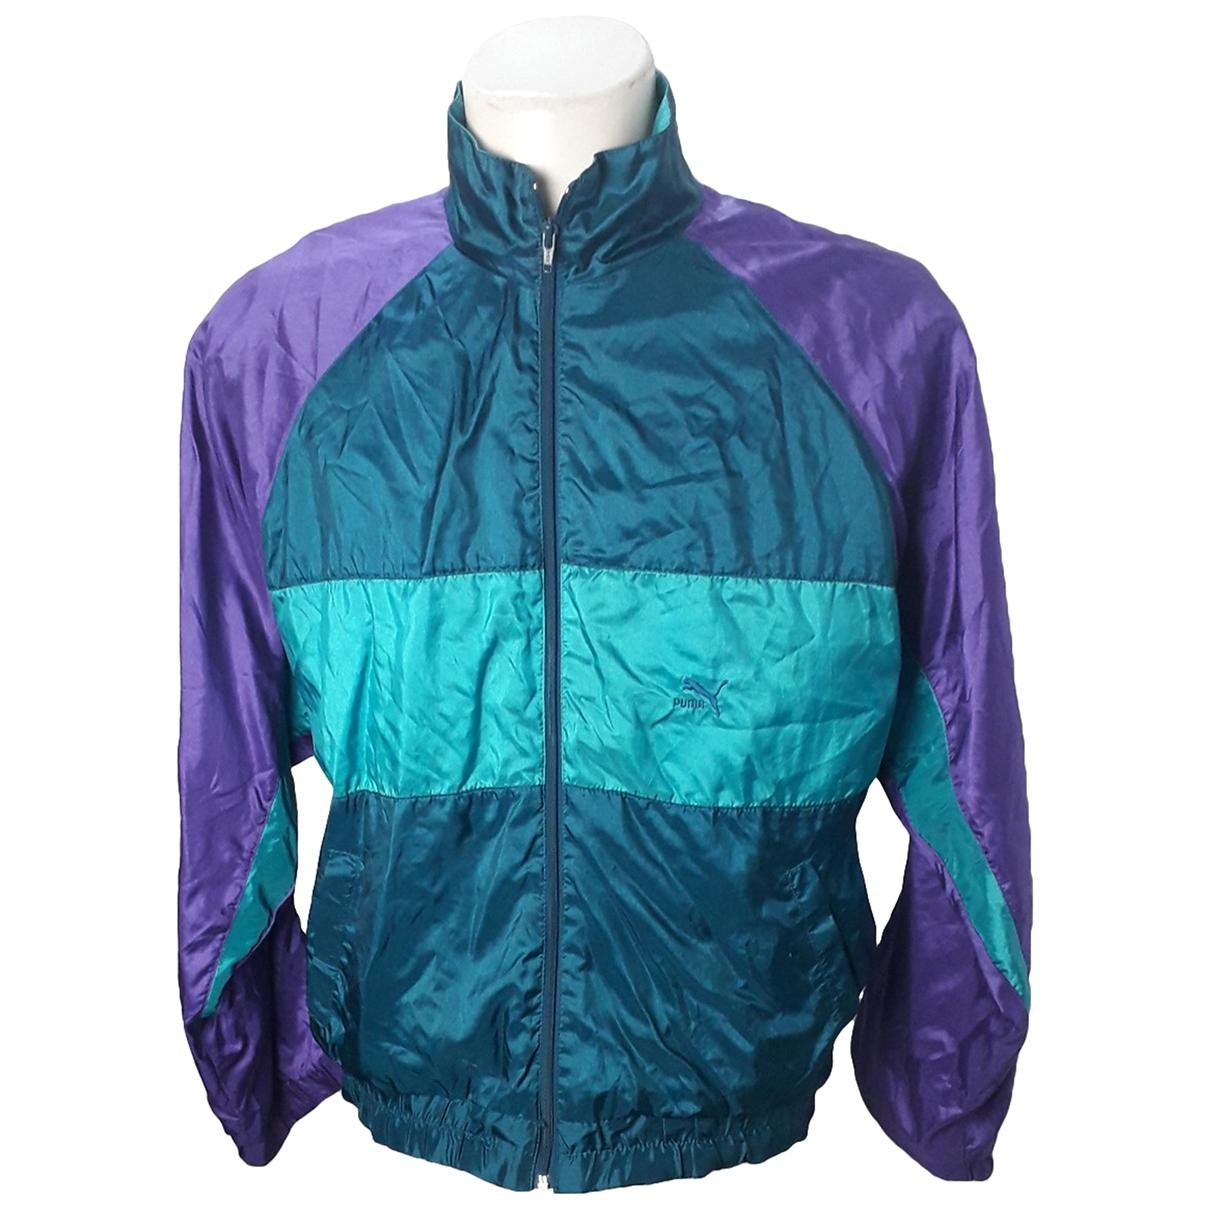 Puma \N Multicolour jacket  for Men L International